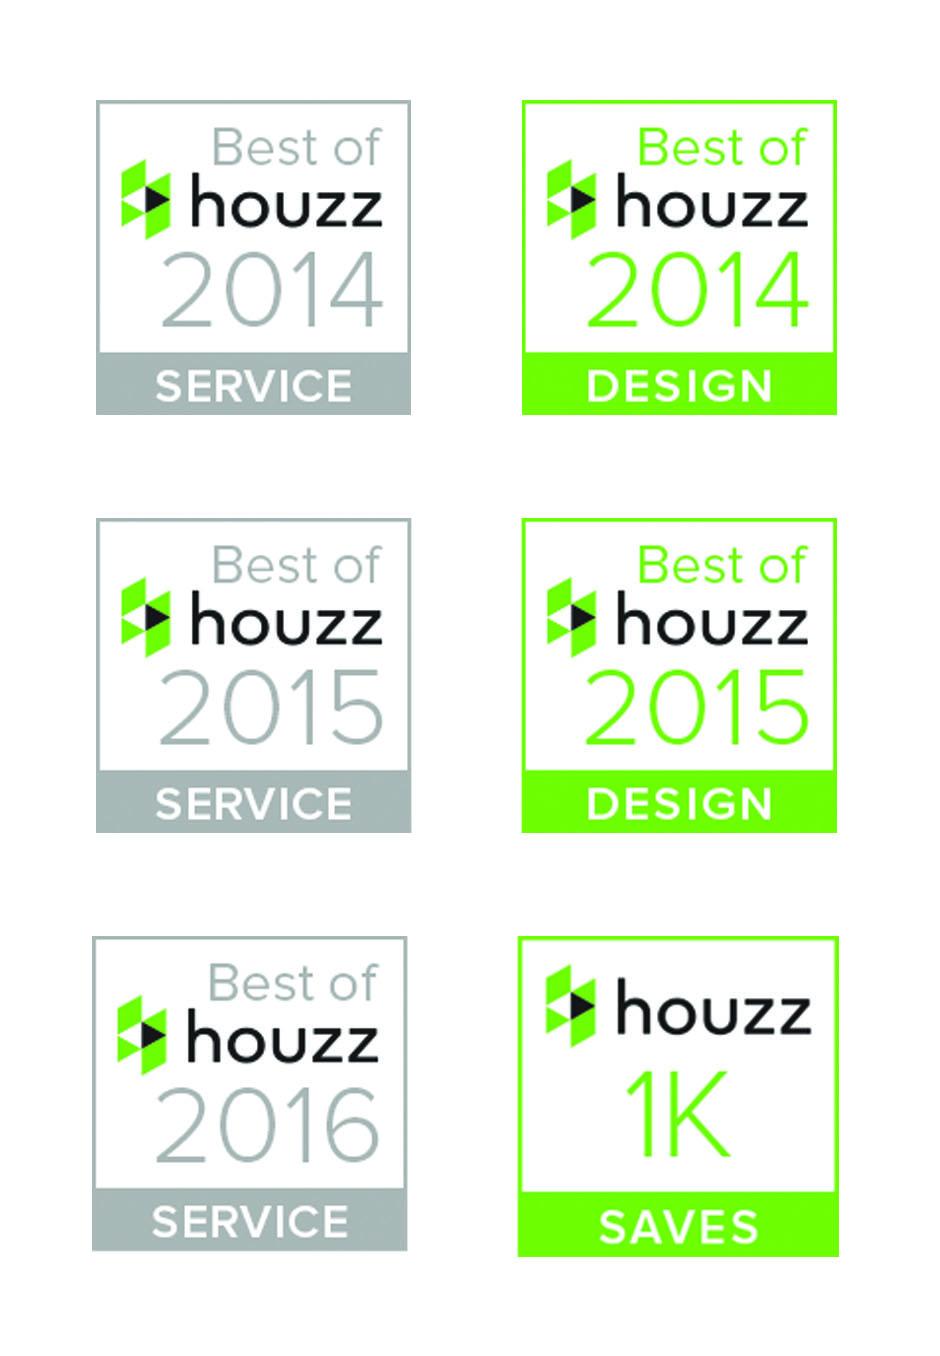 best of houzz logos.jpg